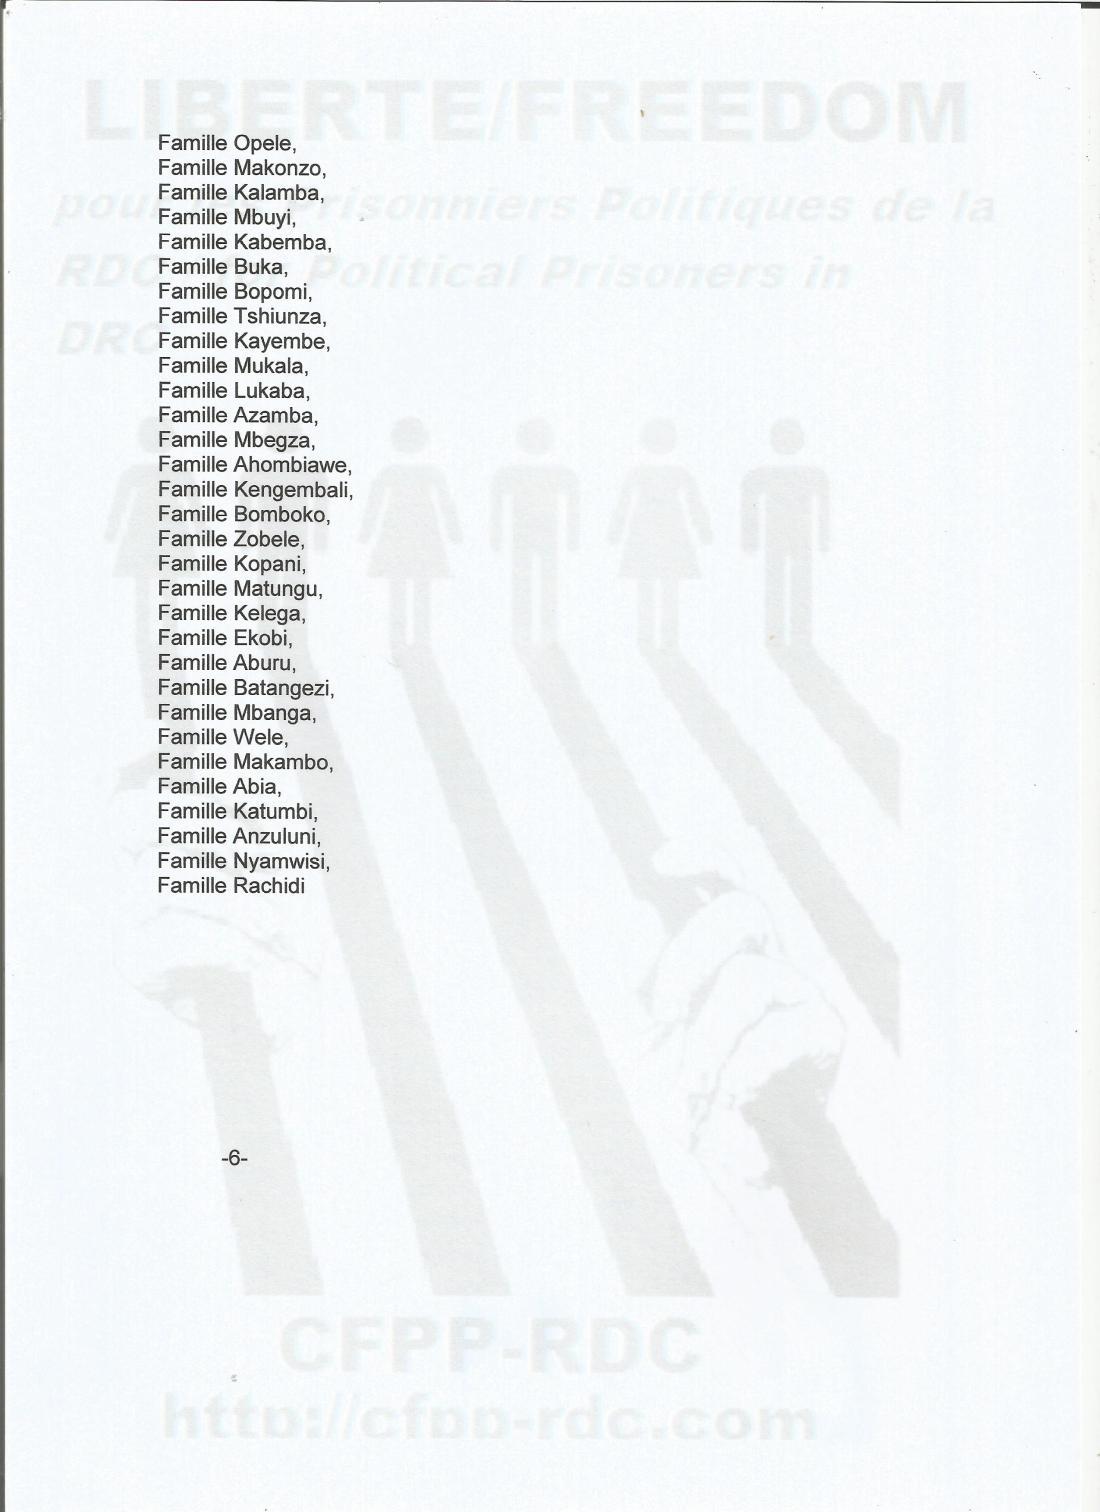 MEMORANDUM A LA CENCO 14.11.180006